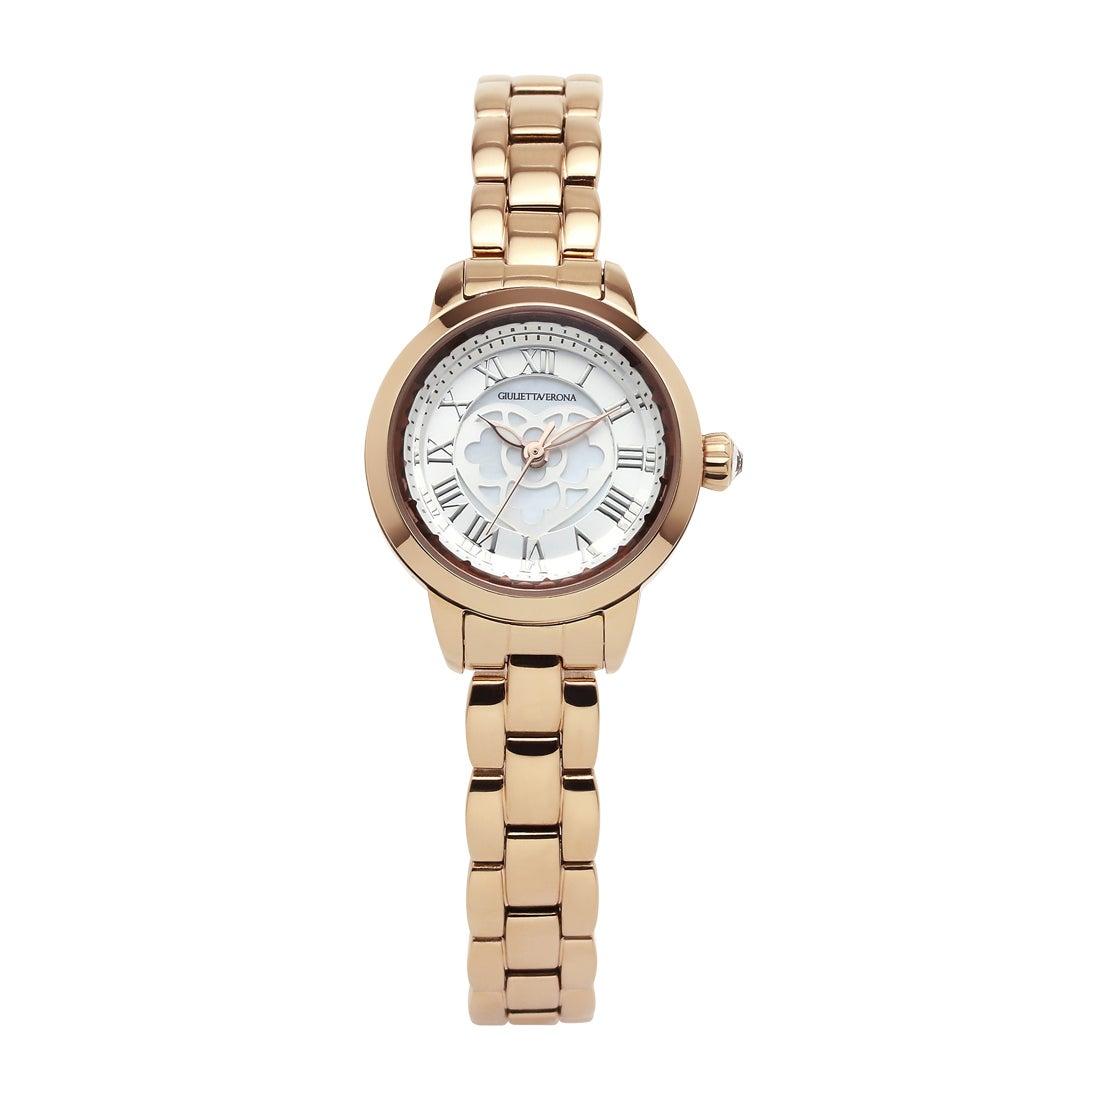 【SAC'S BAR】ジュリエッタヴェローナ GIULIETTAVERONA 腕時計 GV003P LOVE VERONA シルバー×ゴールド